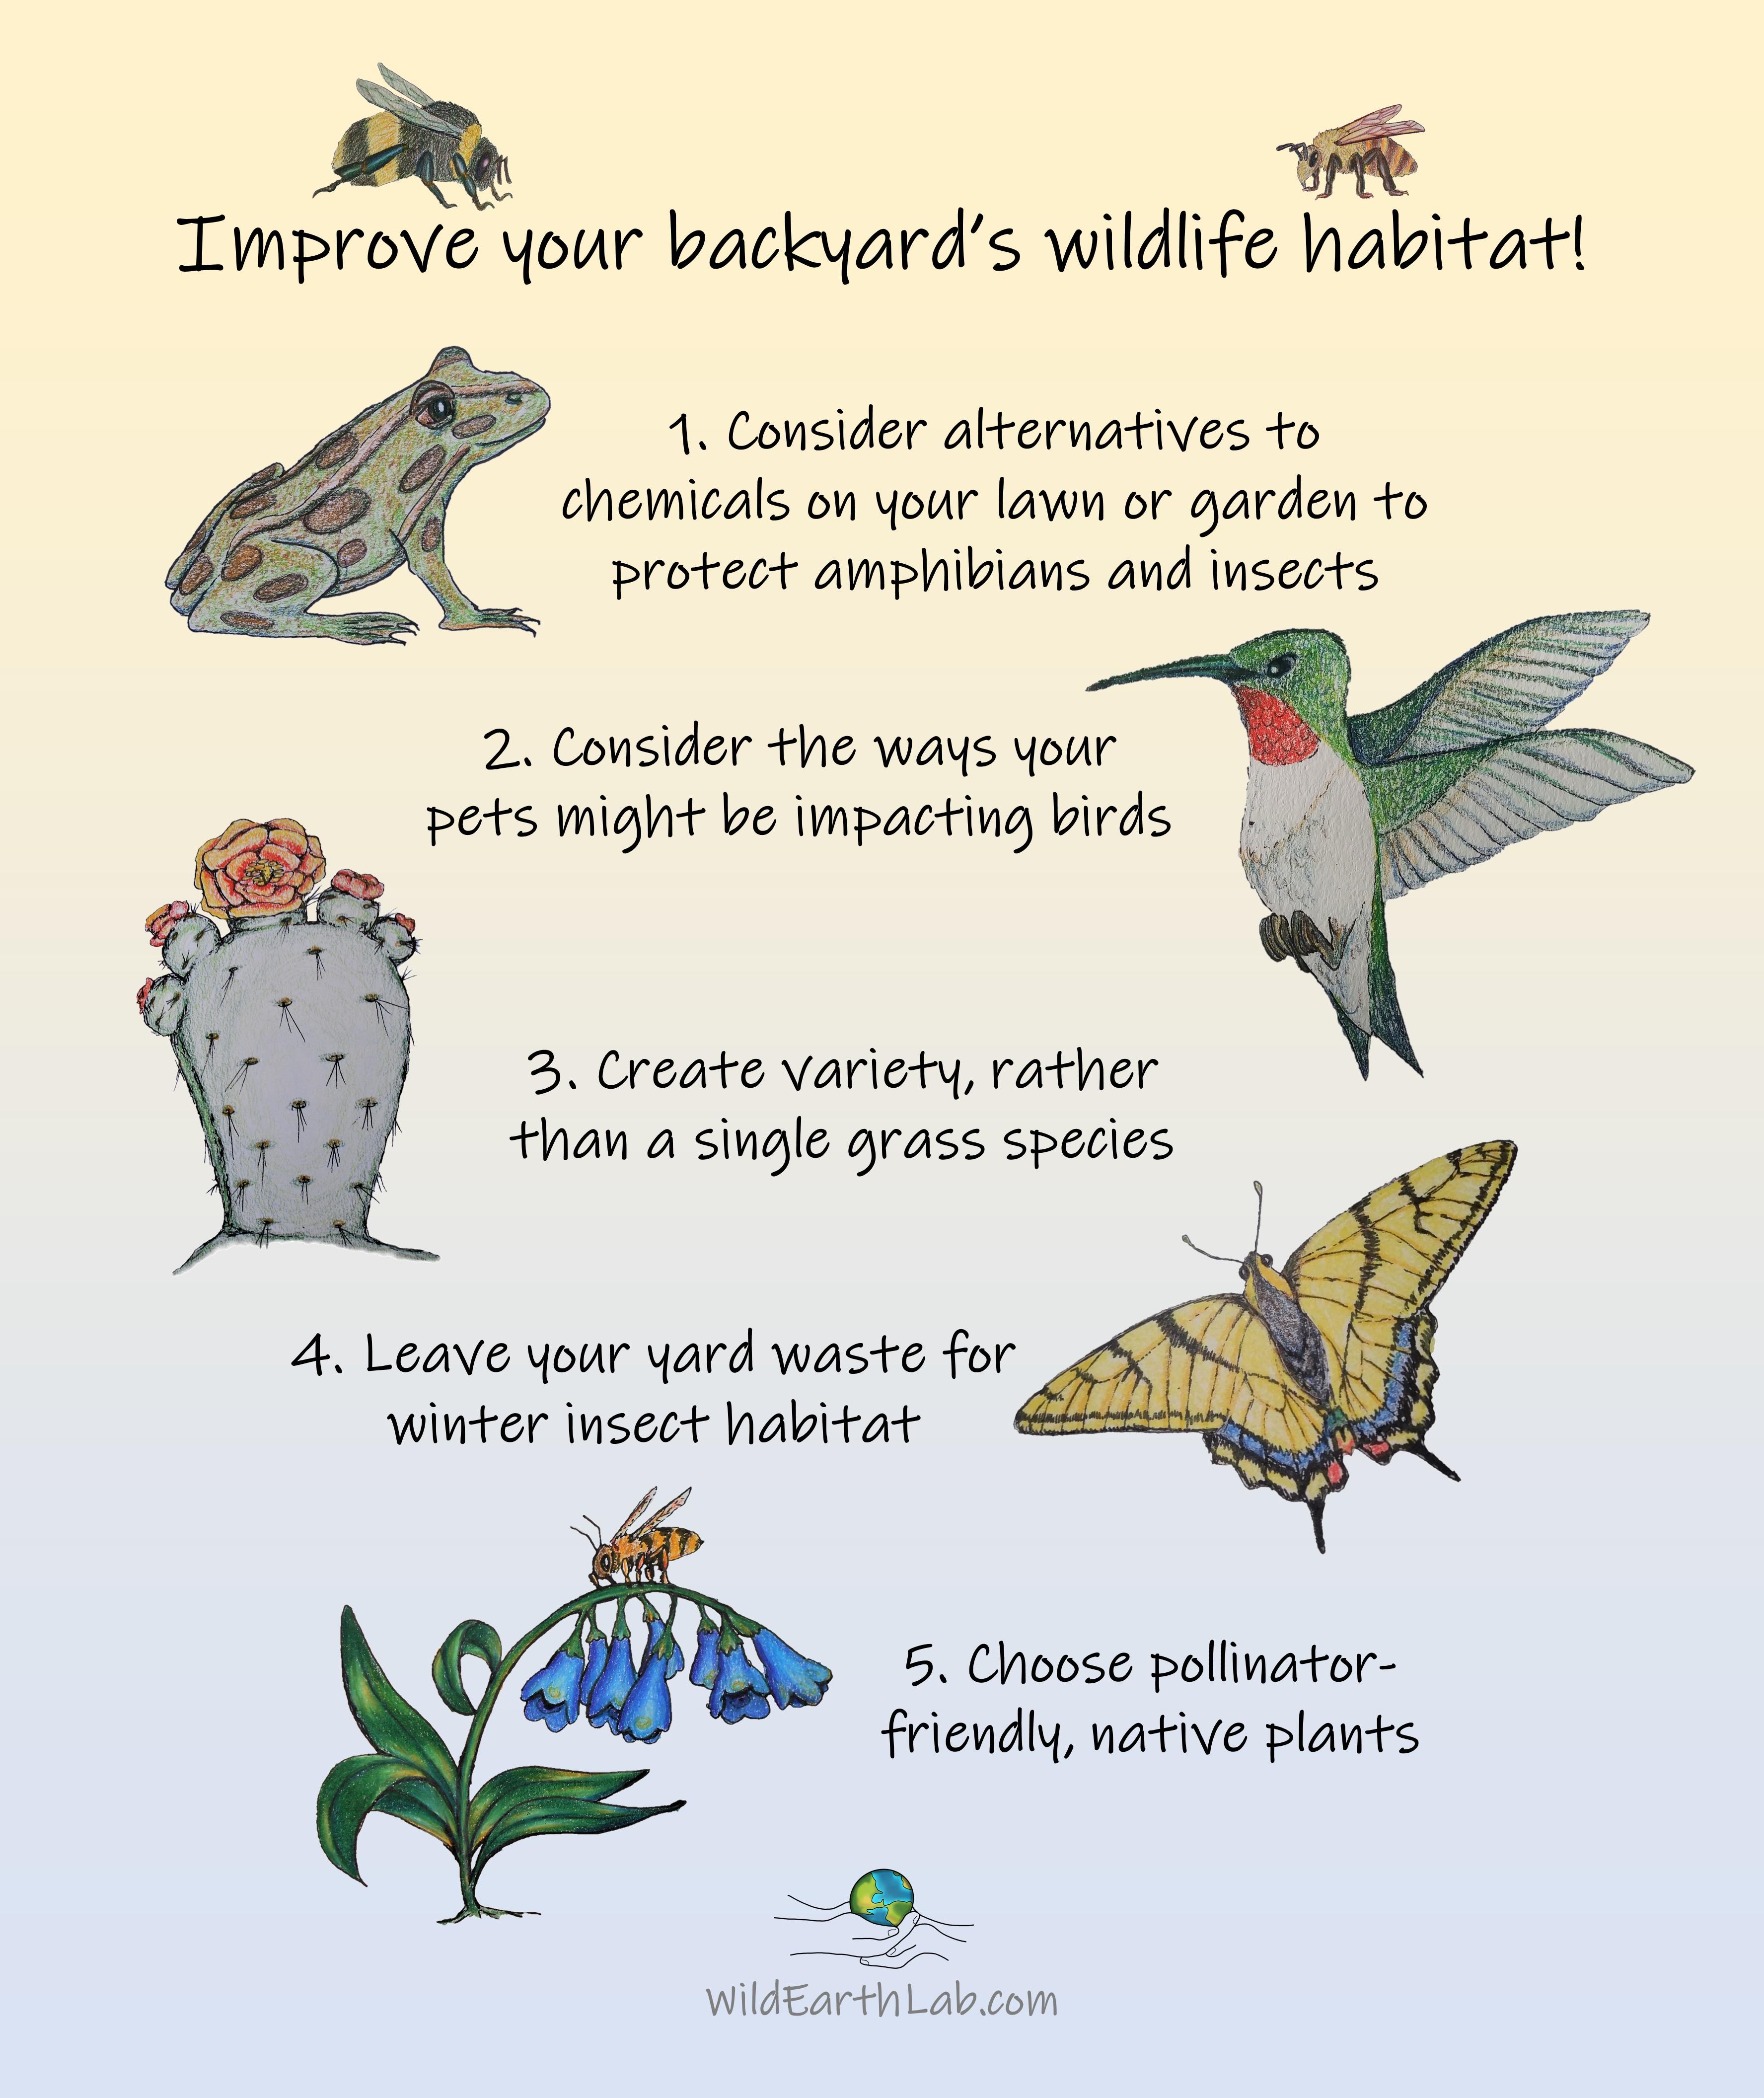 Improve your backyard's wildlife habitat by Wild Earth Lab